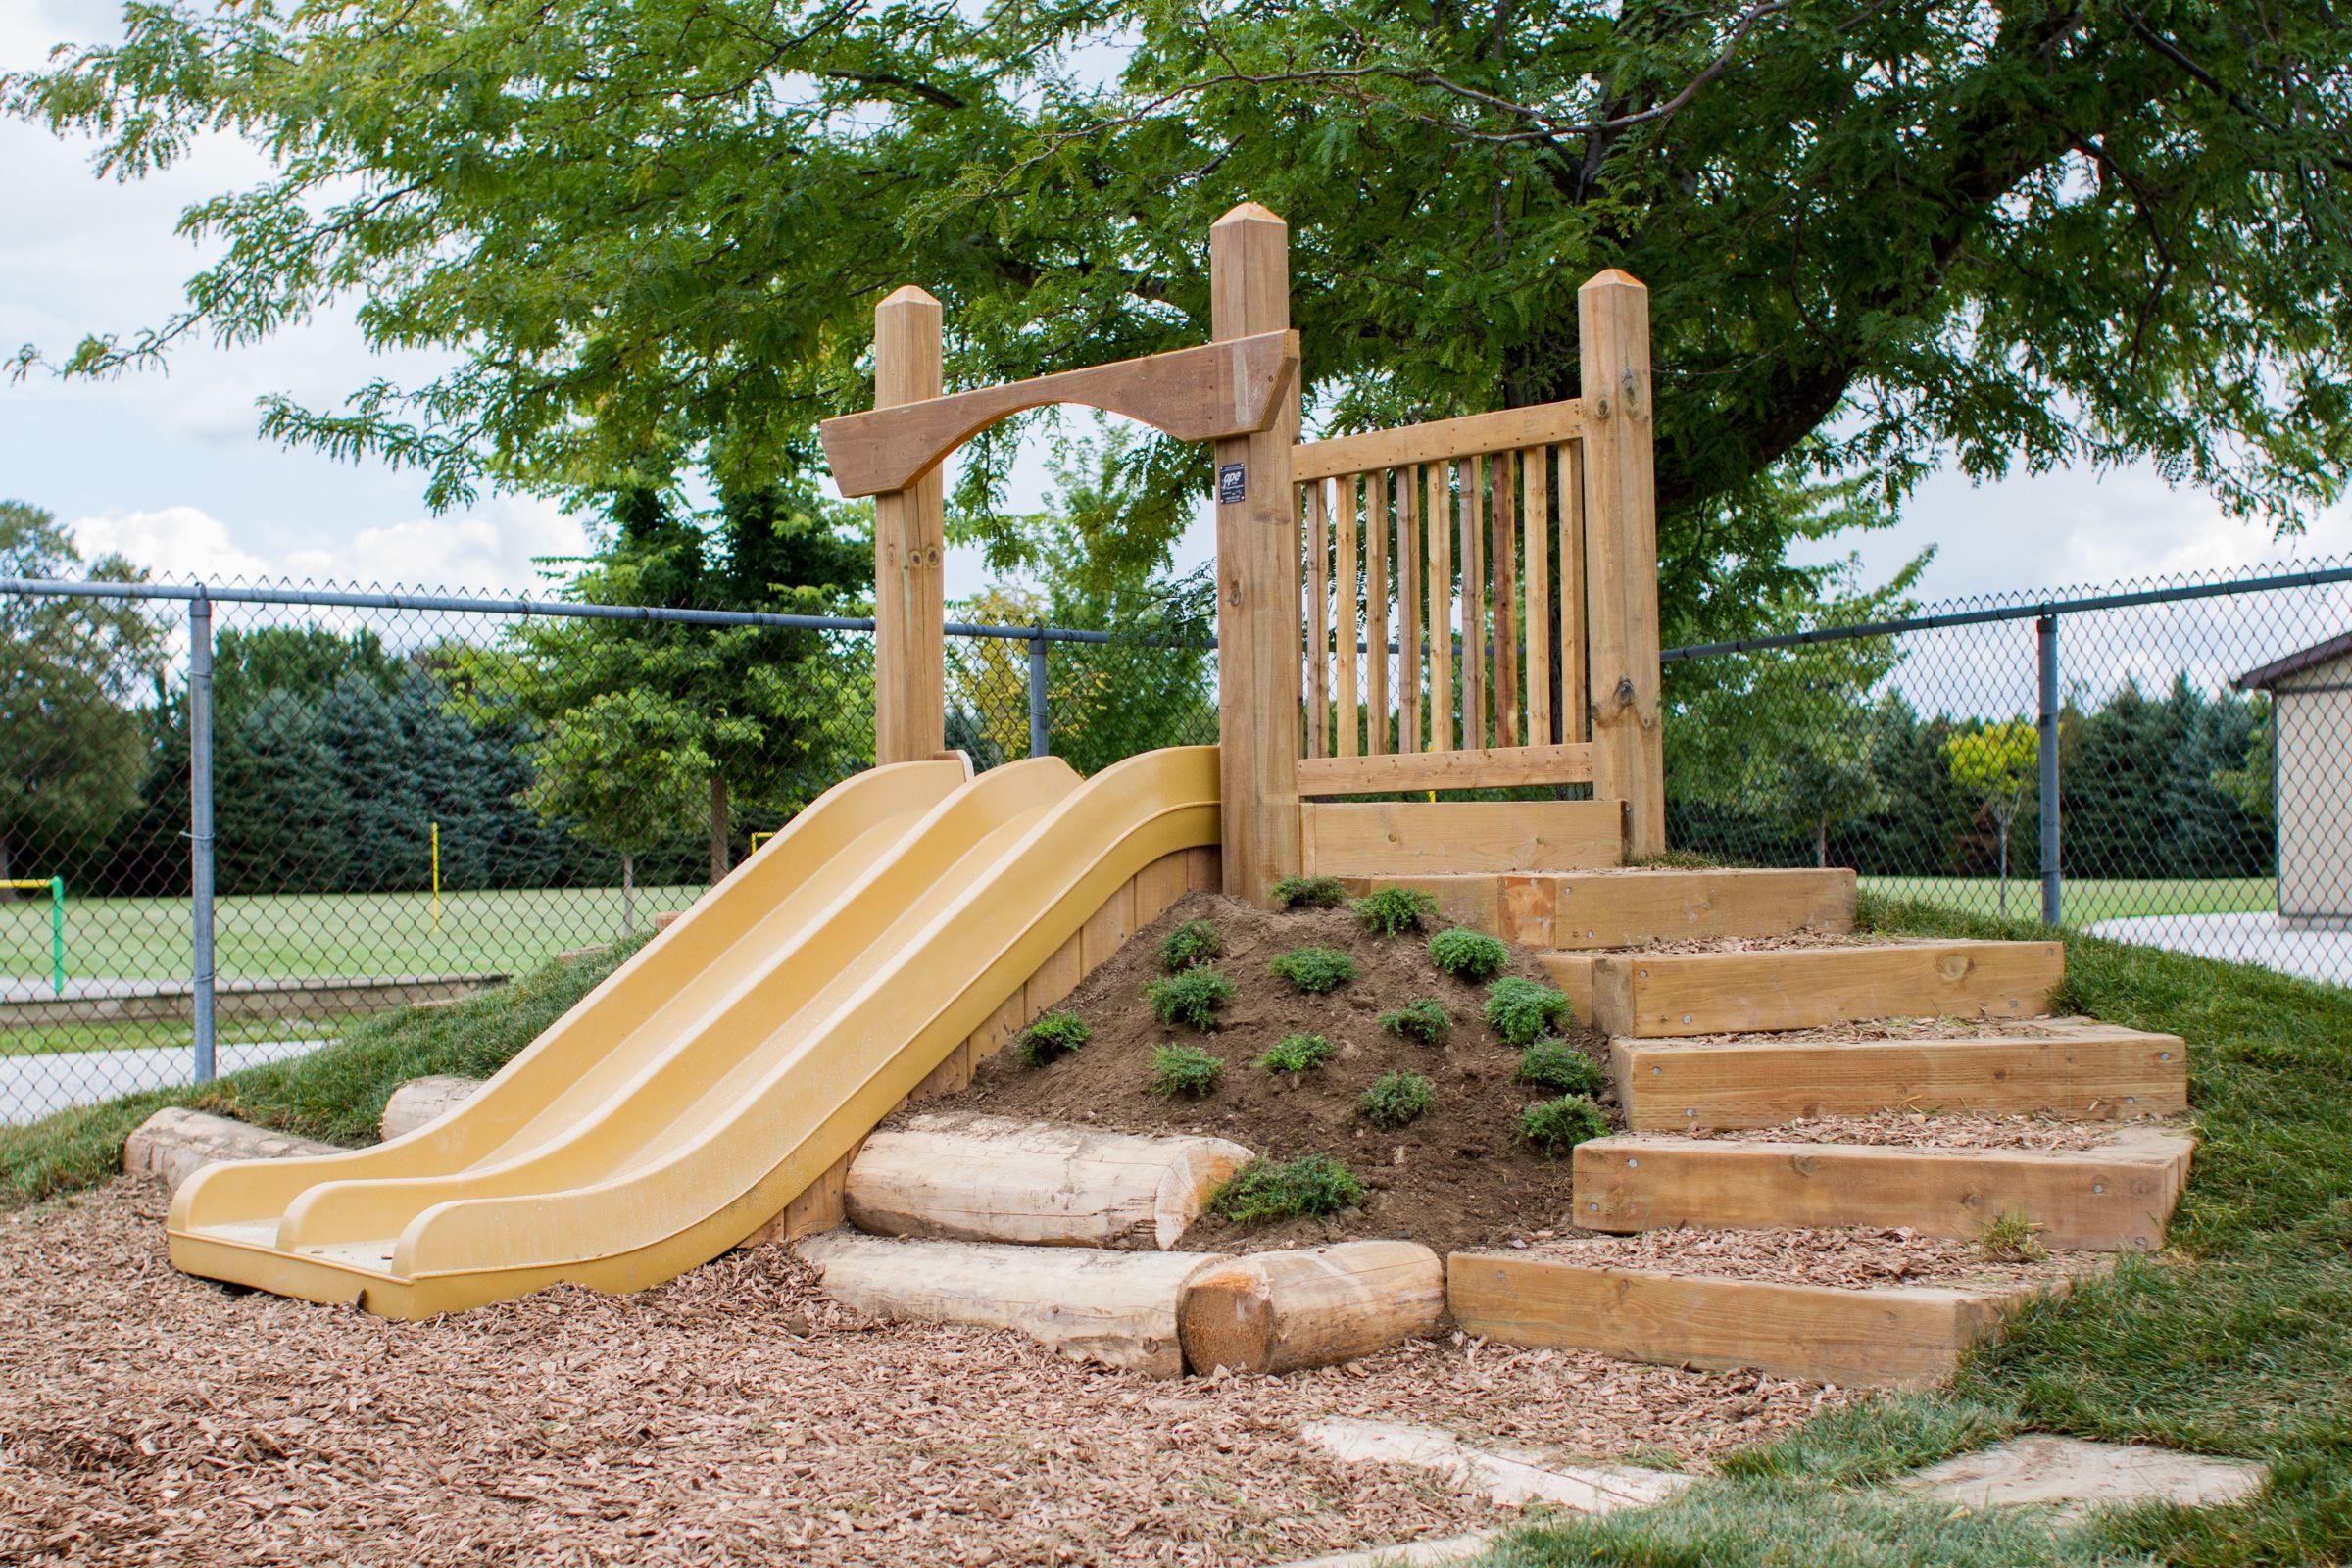 Natural Playground Hill Slide By Ape Natural Playground Play Area Backyard Backyard For Kids Diy backyard hill slide